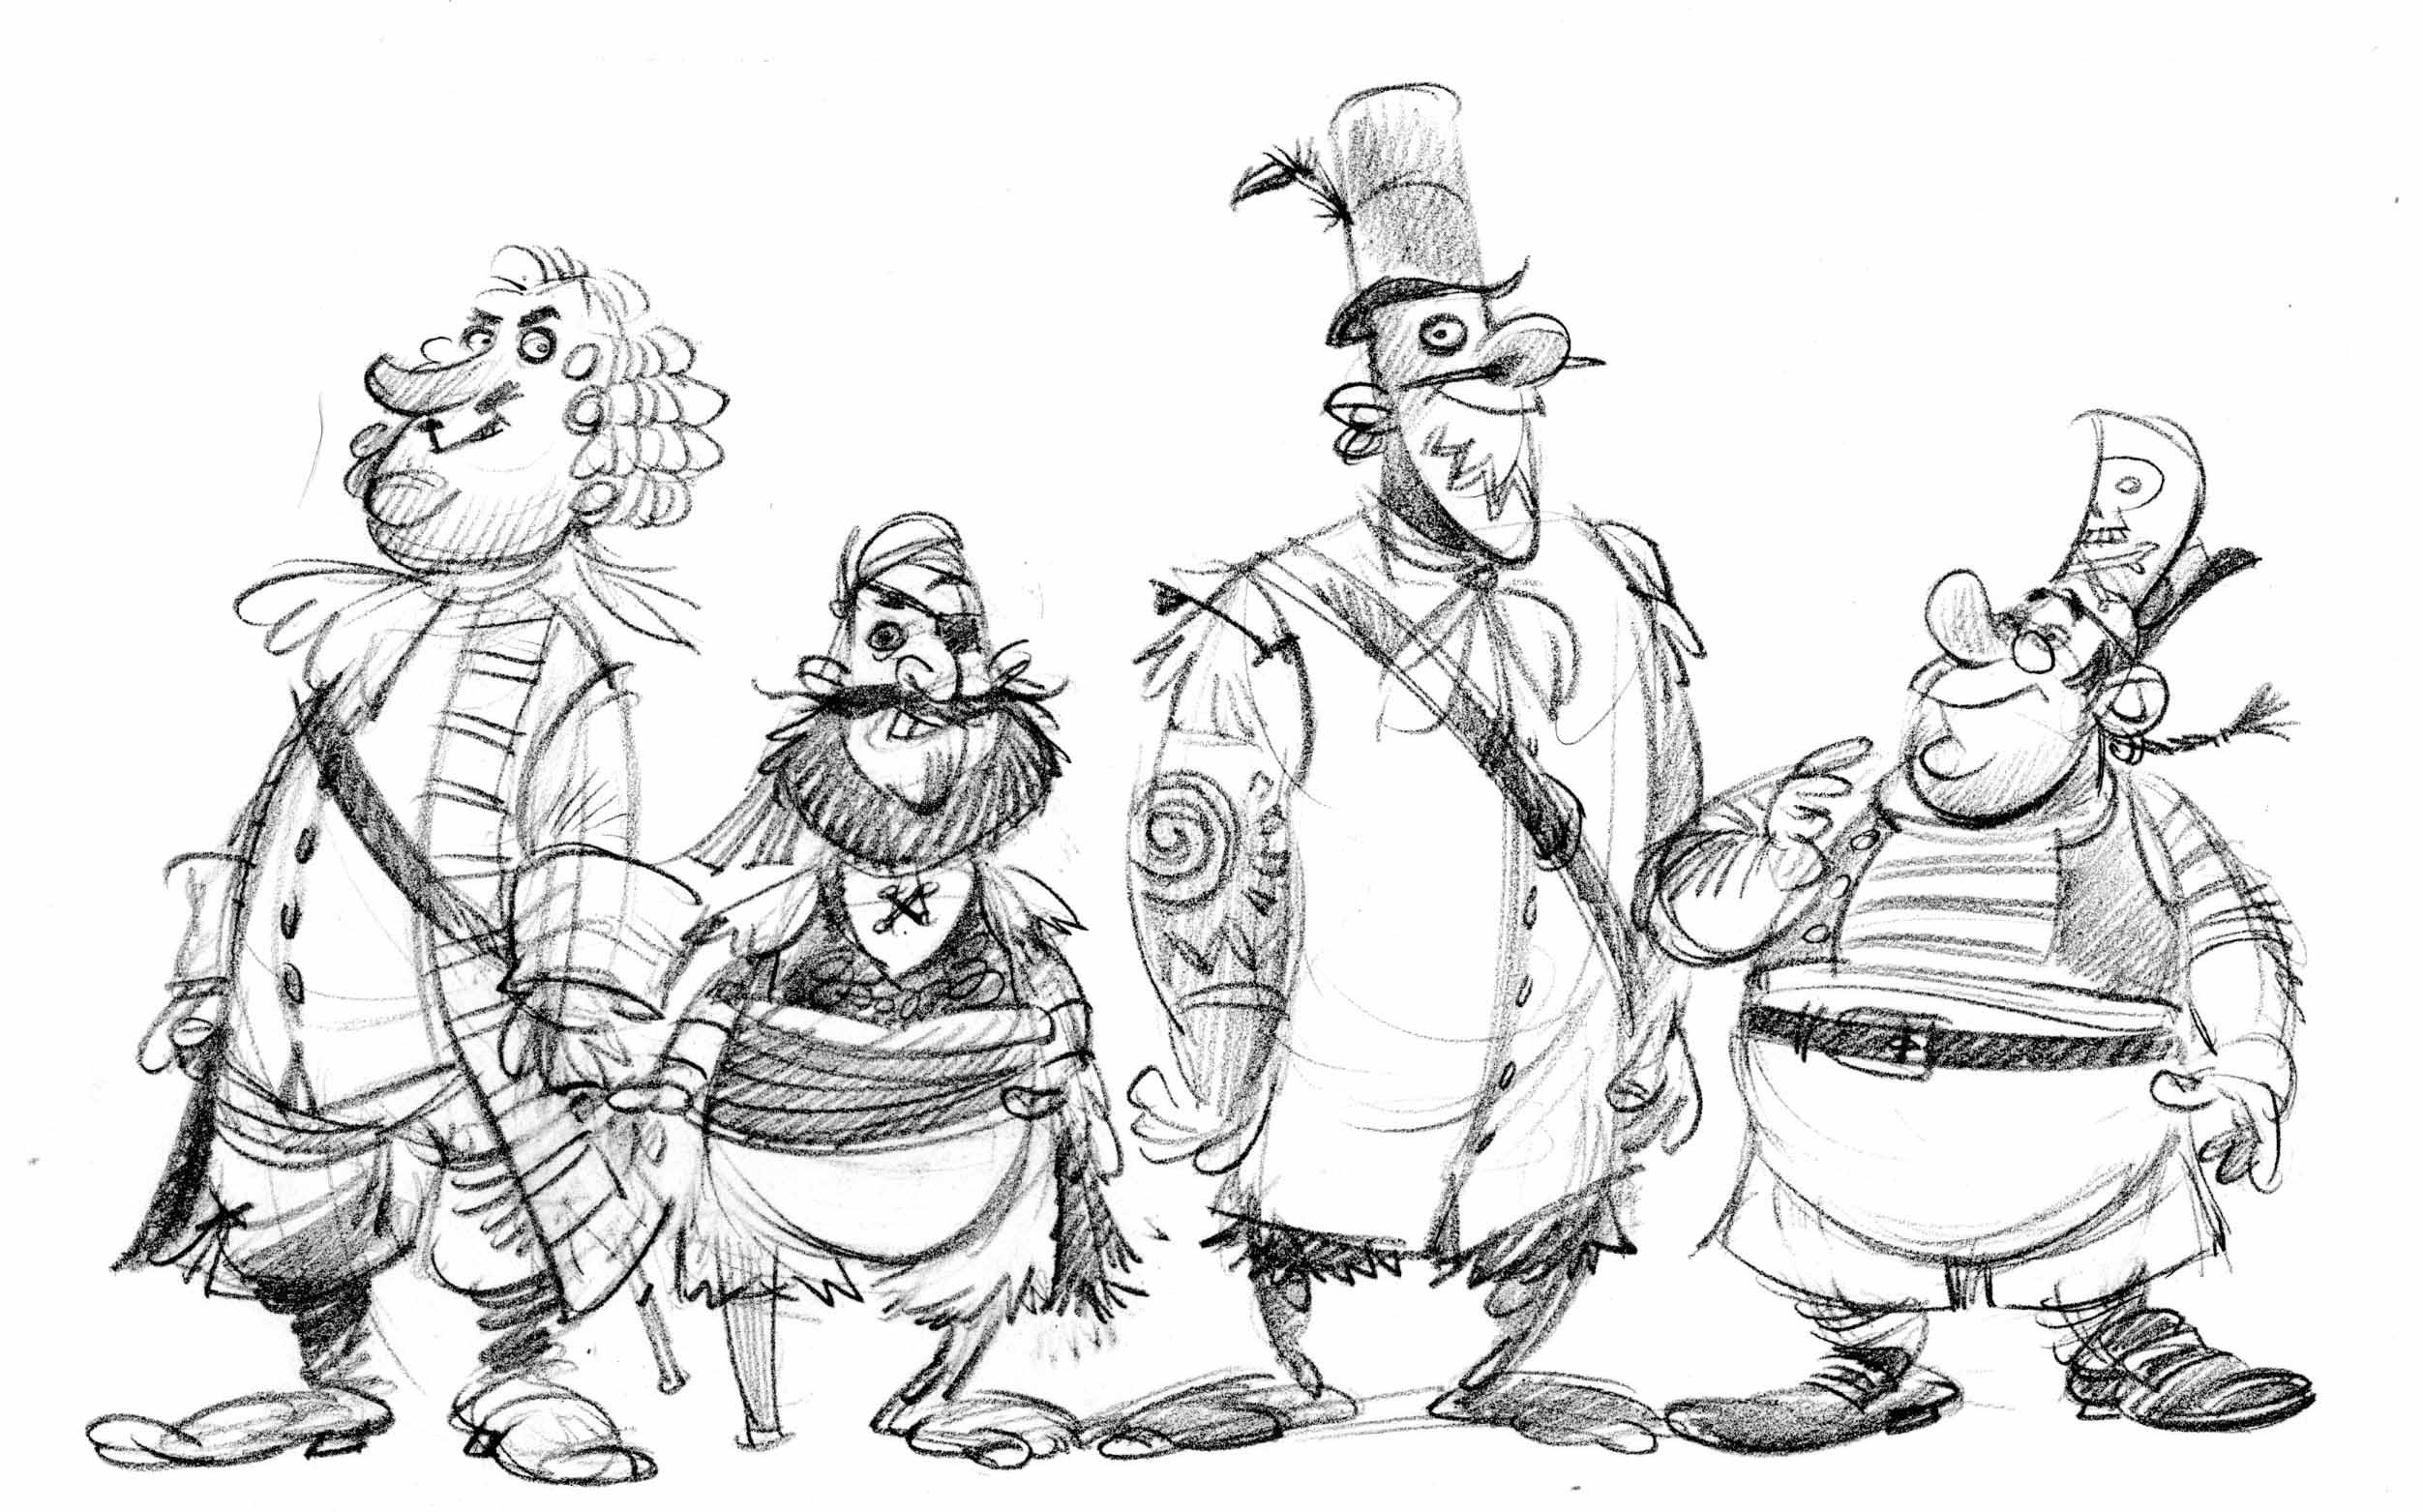 Drawn pirate penzance Manders' John Blog comment Leave